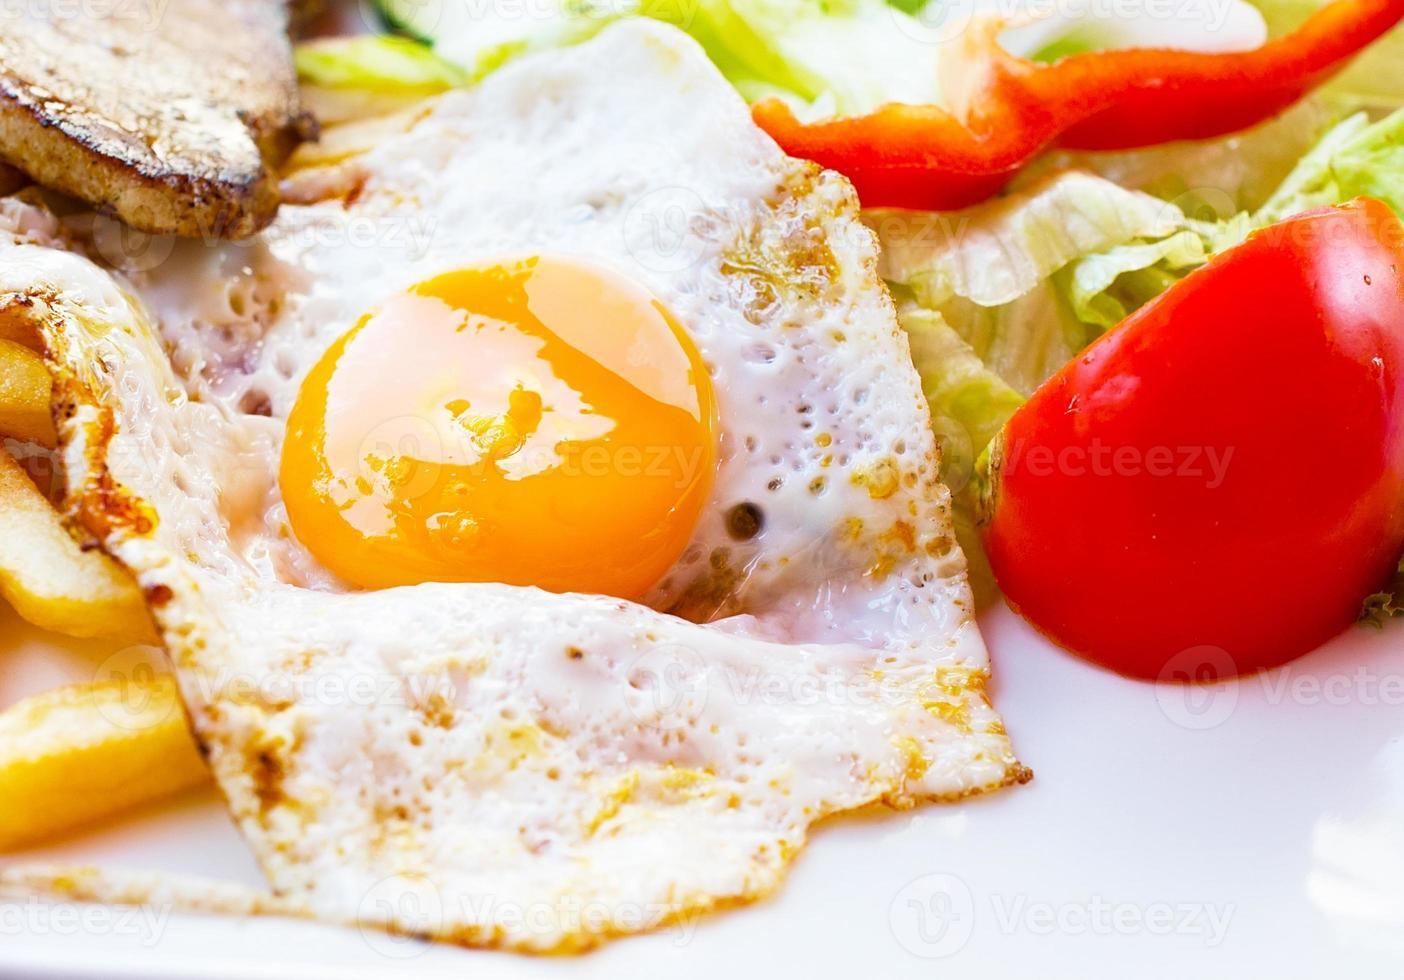 huevo frito con papas fritas, filete a la parrilla. foto